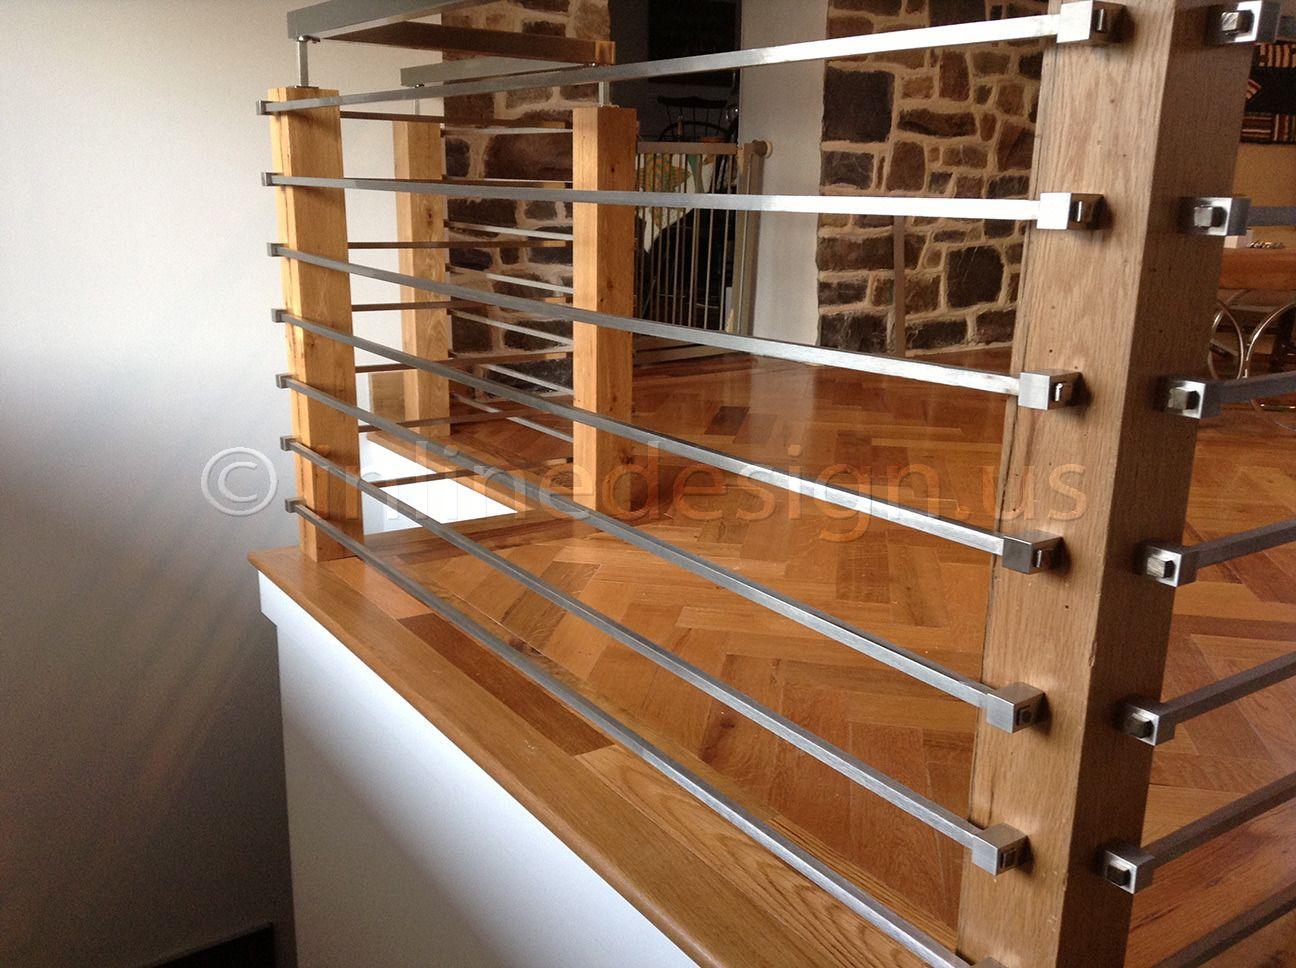 Metal And Wood Modern Railings The Nancy Album Modern | Wood And Steel Handrail | Outdoor | Column | Stainless Steel | Balustrade | Ultra Modern Steel